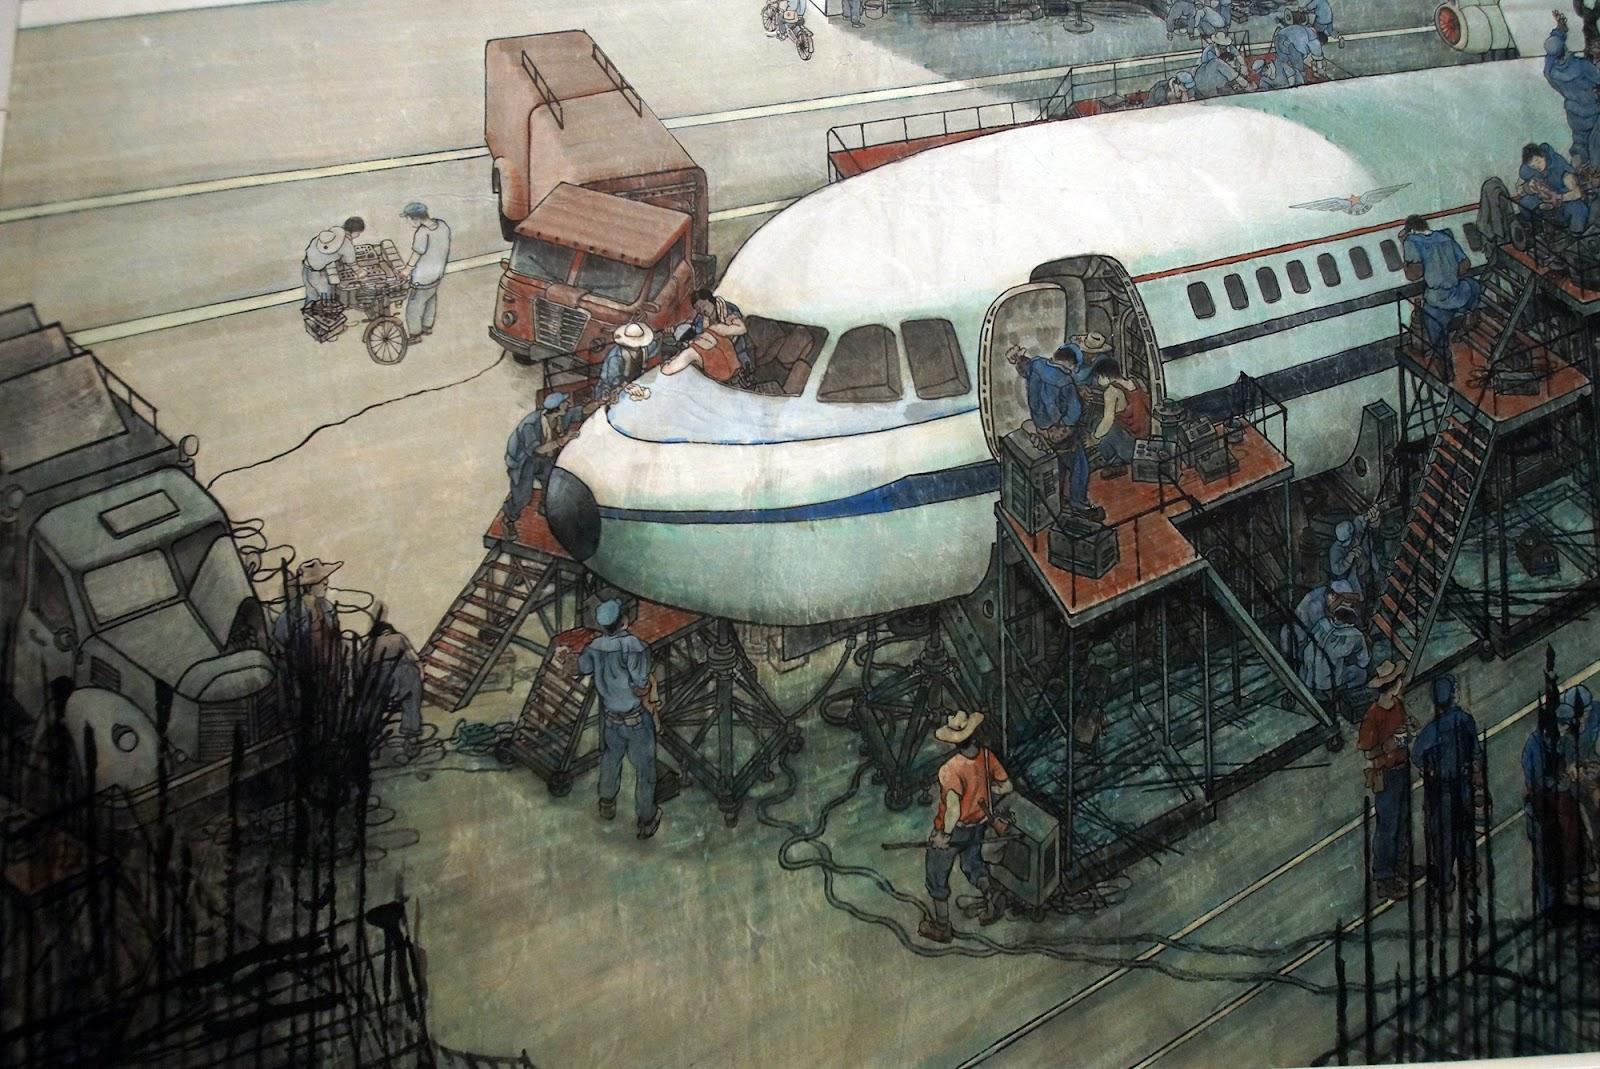 SHANGWHY: Peinture néo-réaliste Chinois